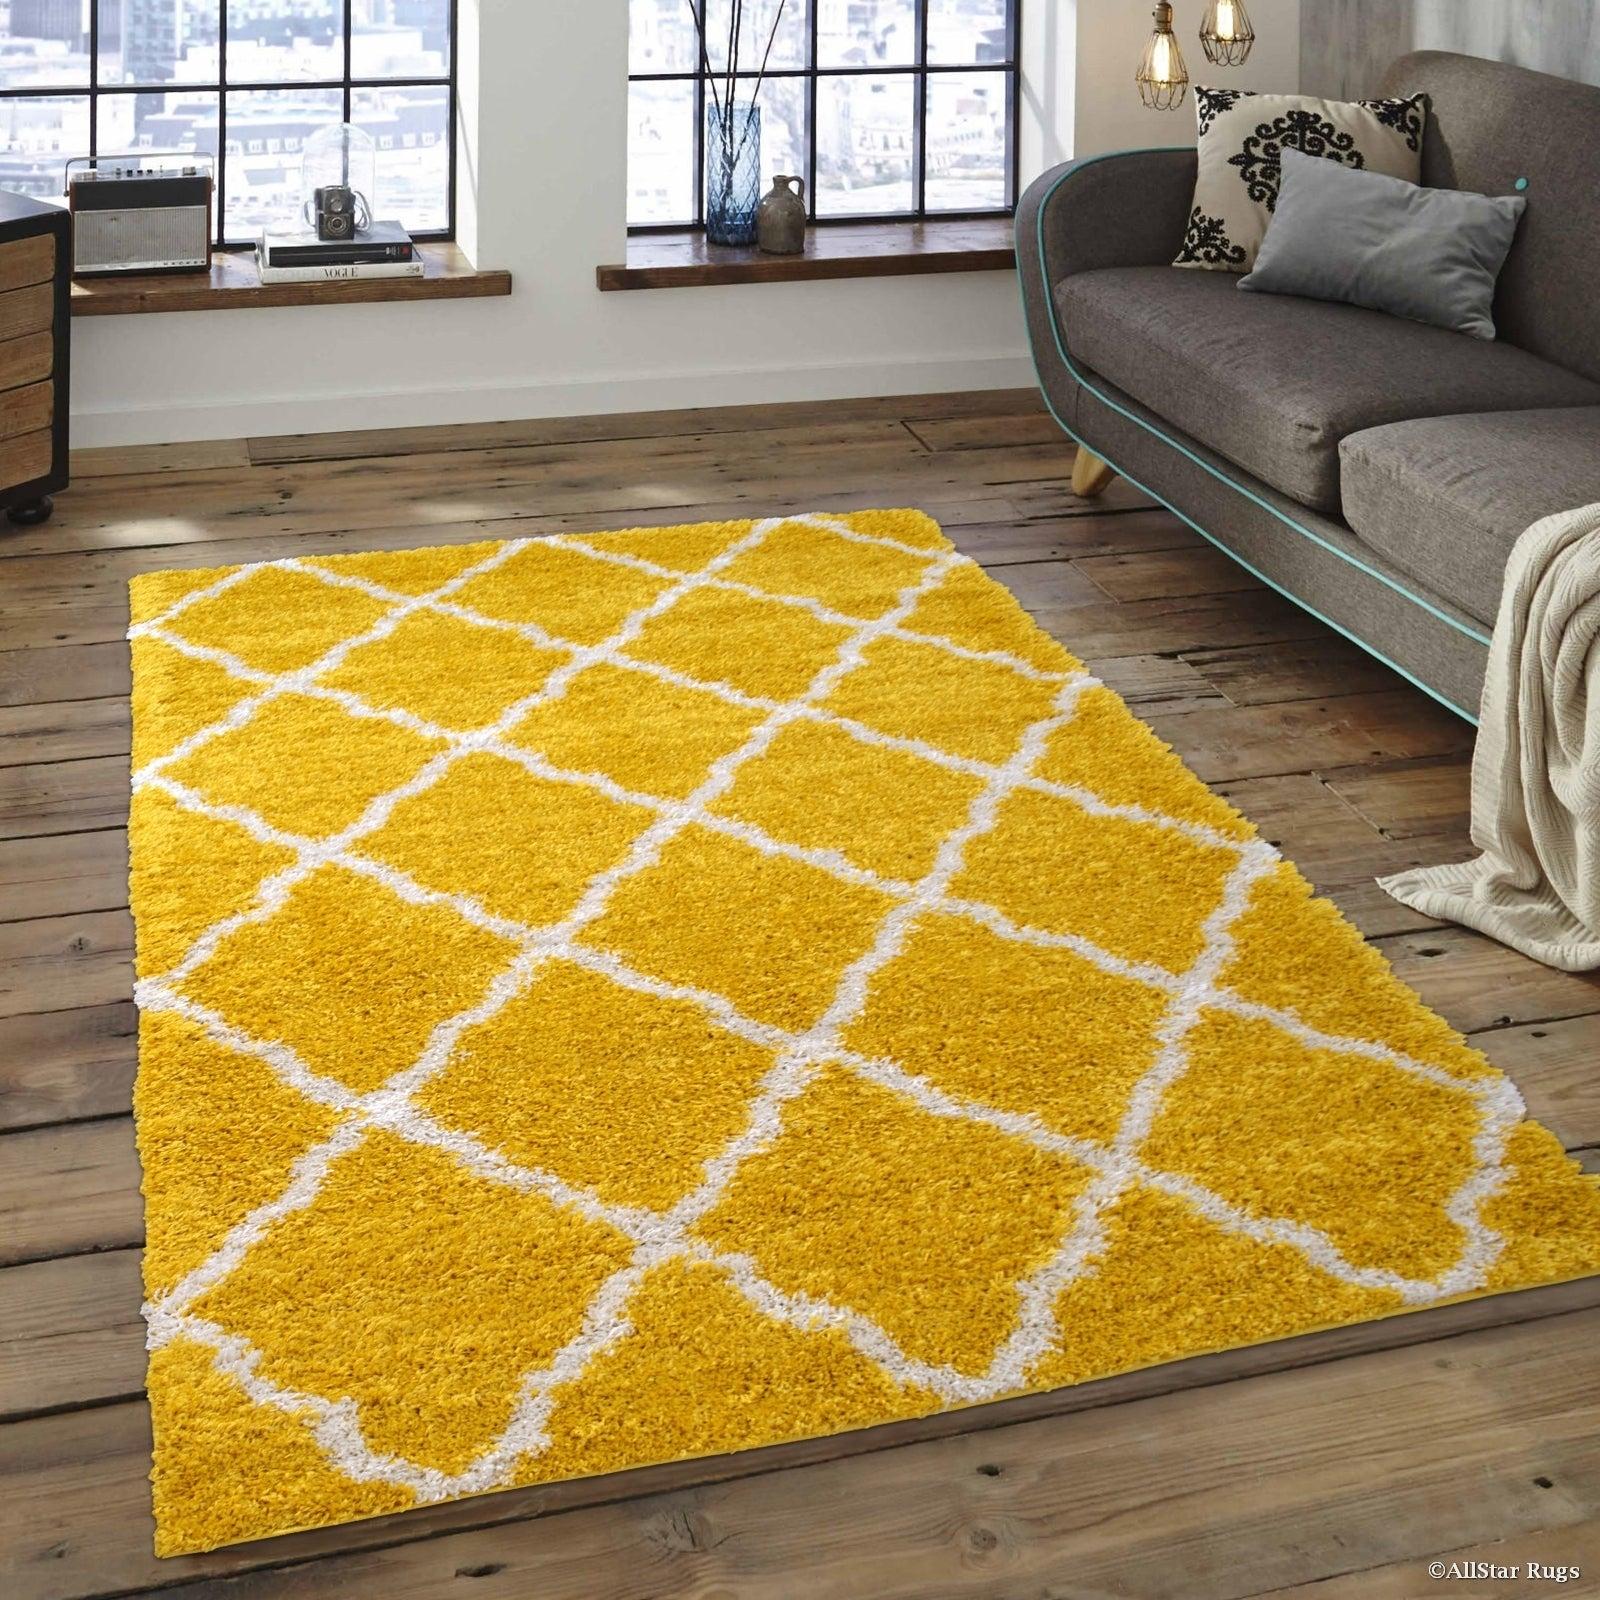 Patterned Area Rugs Best Design Inspiration